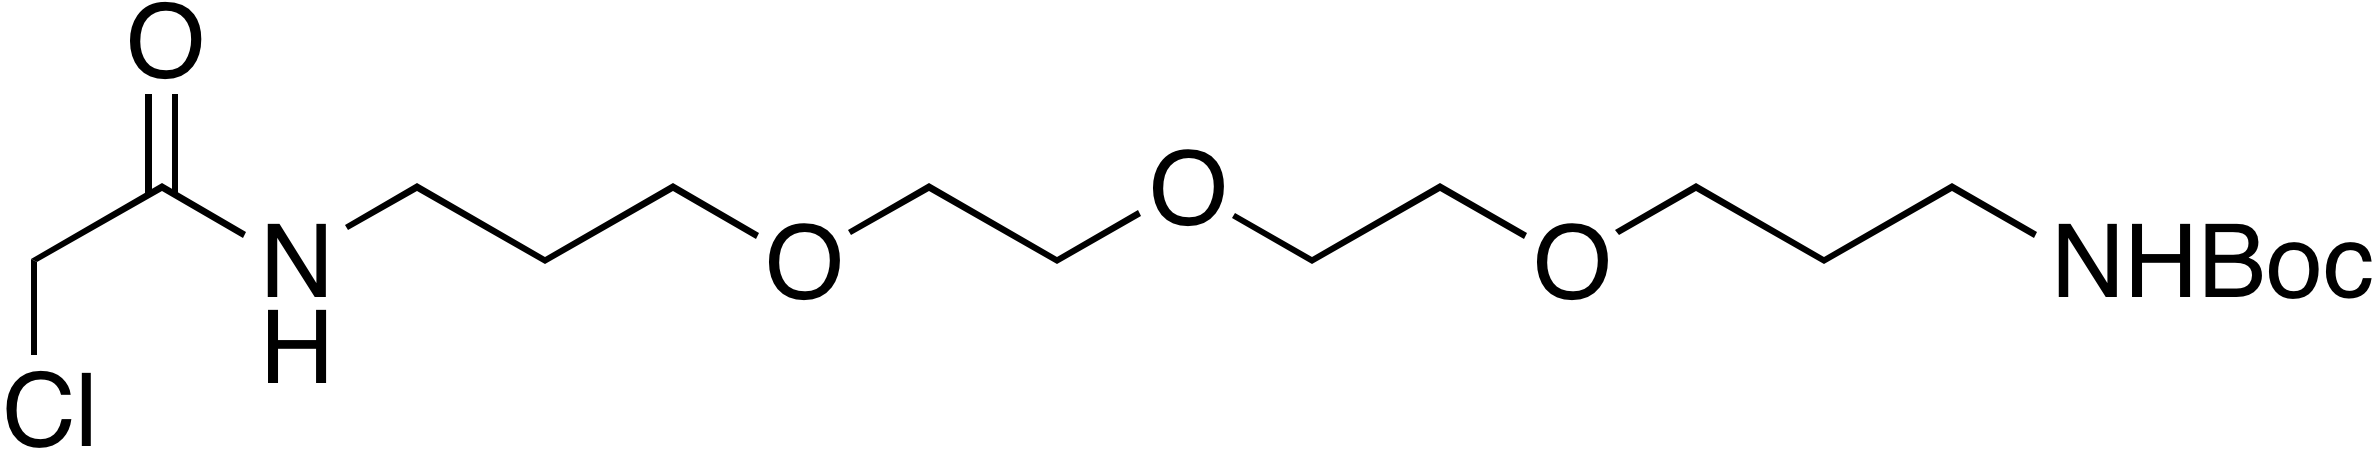 tert-Butyl (1-chloro-2-oxo-7,10,13-trioxa-3-azahexadecan-16-yl)carbamate